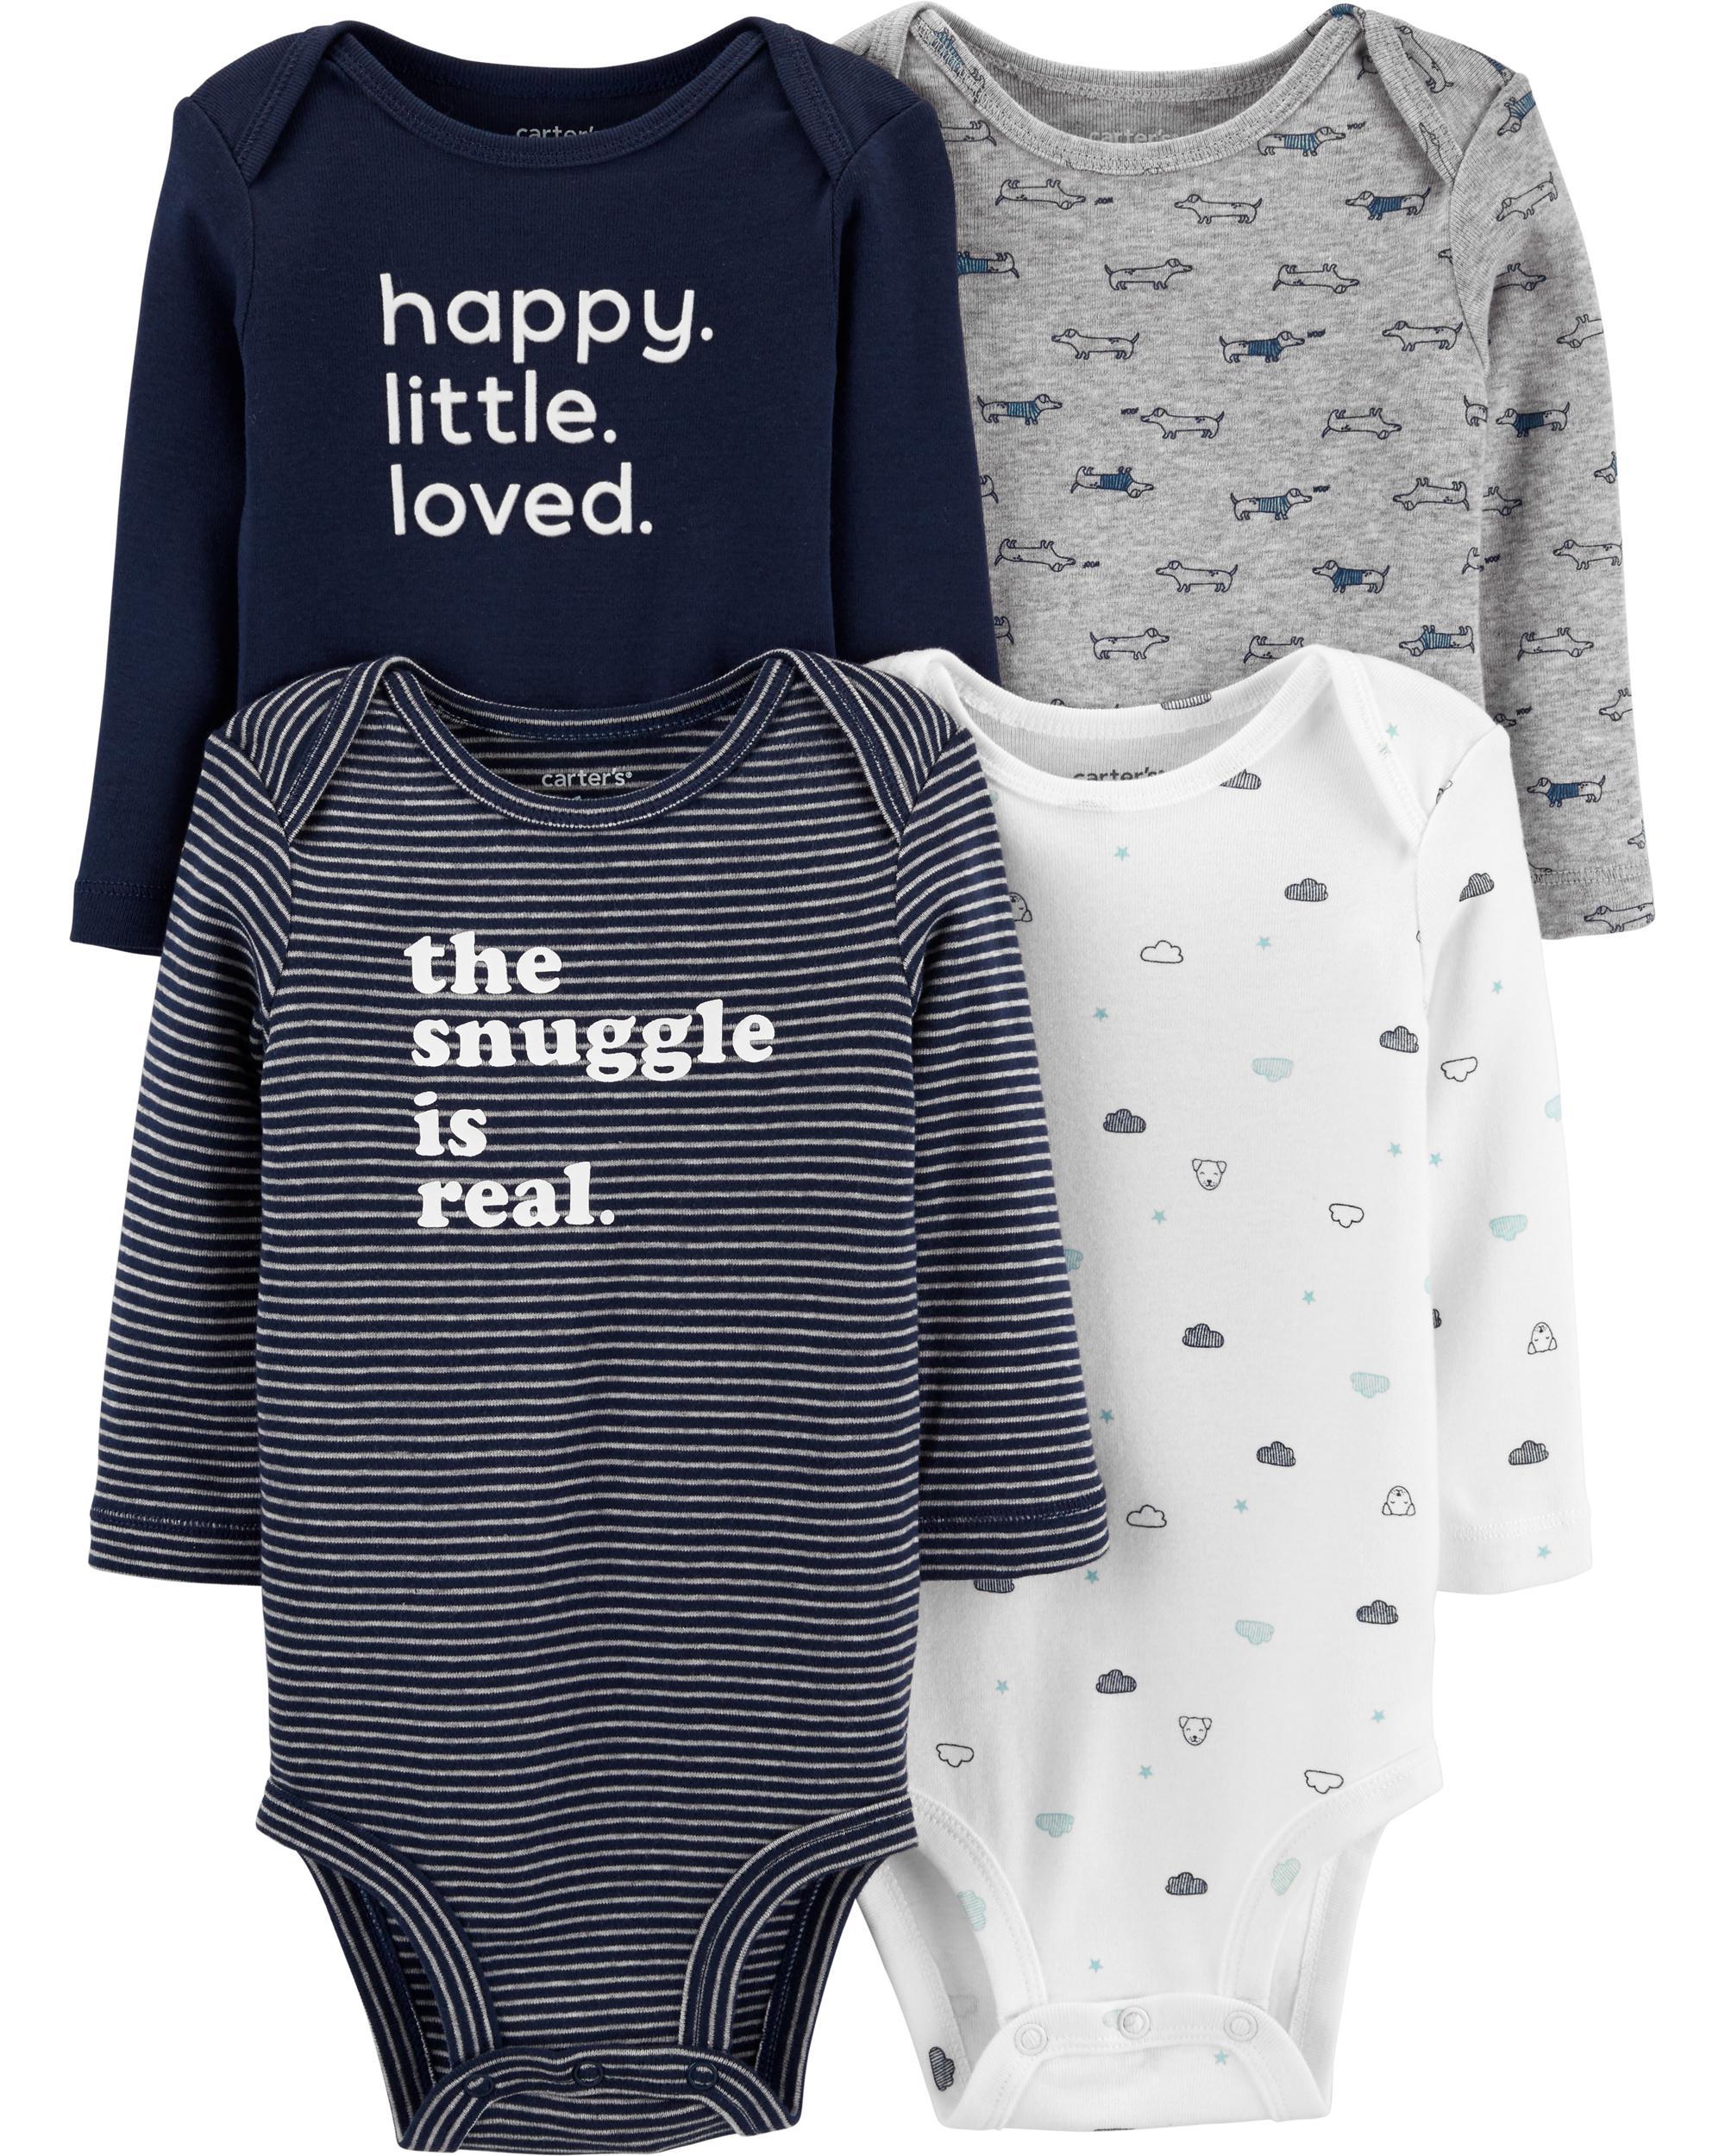 HAPPY רביעיית בגדי גוף